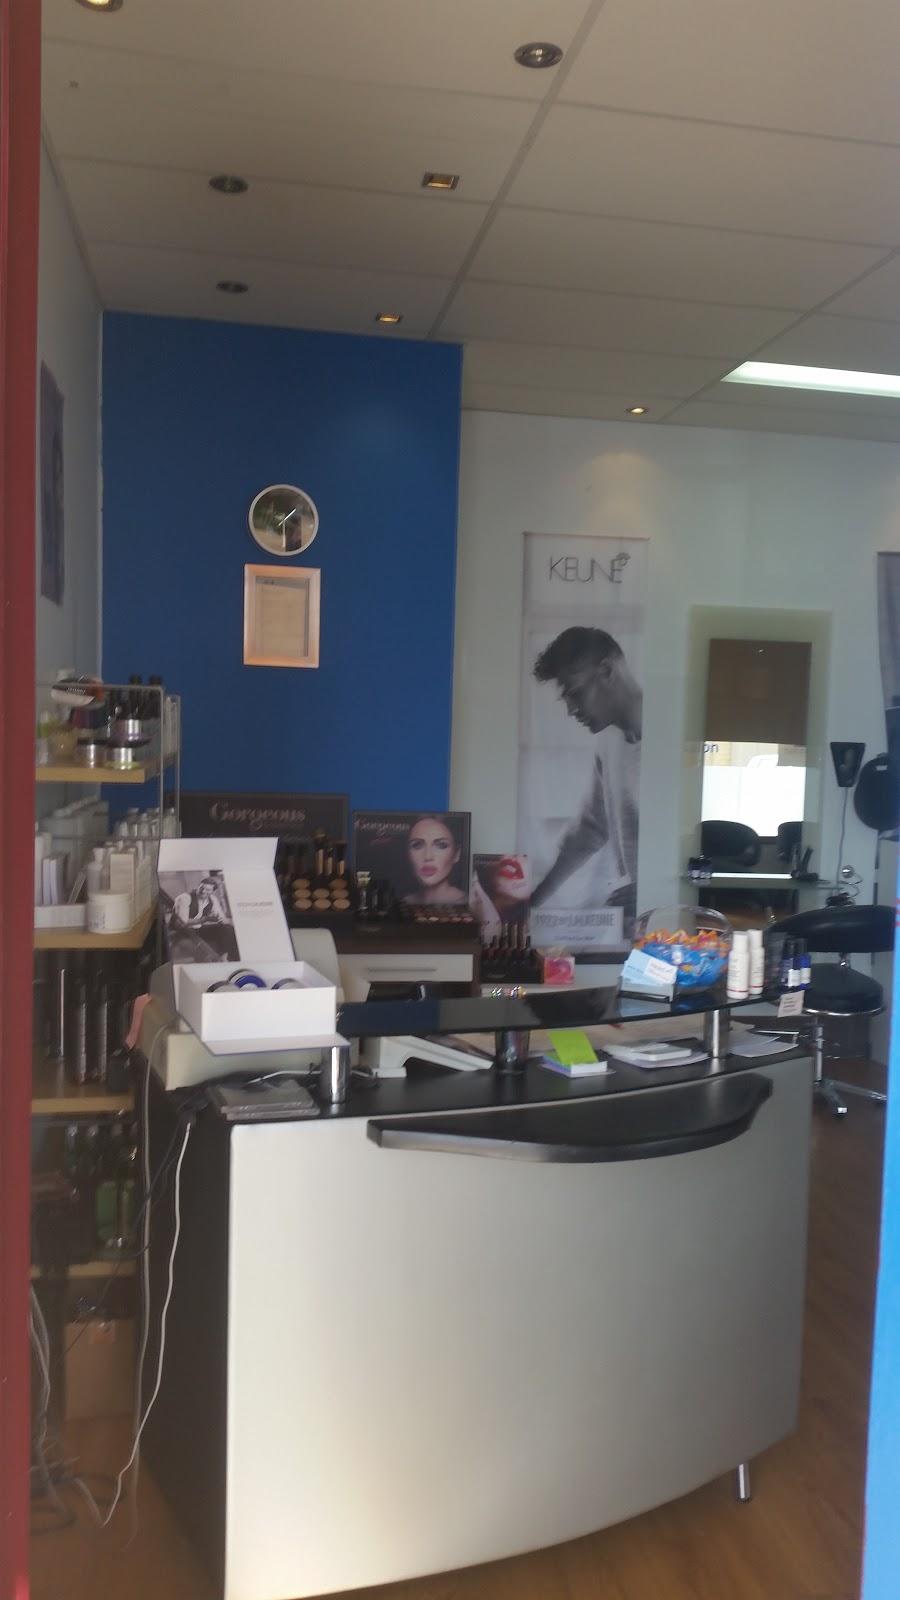 Headz Hairdressing Unisex Hair Salon | hair care | 9/214 Campbell Rd, Canning Vale WA 6155, Australia | 0894552022 OR +61 8 9455 2022